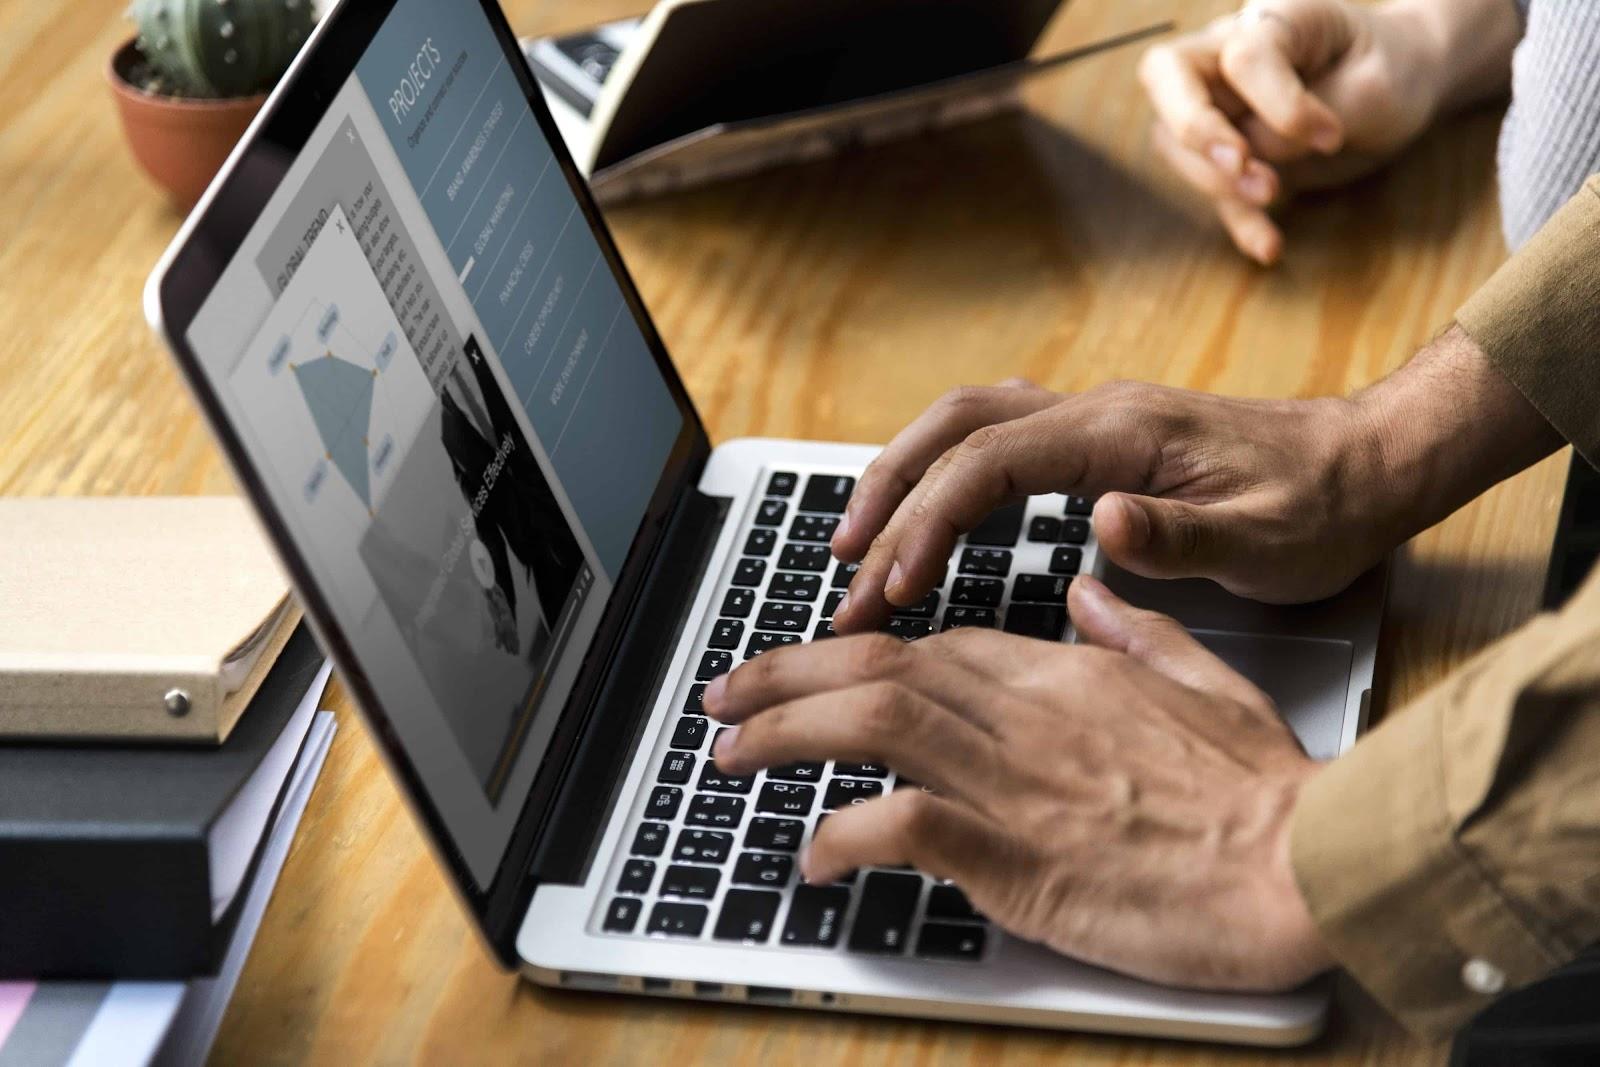 Communicating Virtually on a Computer